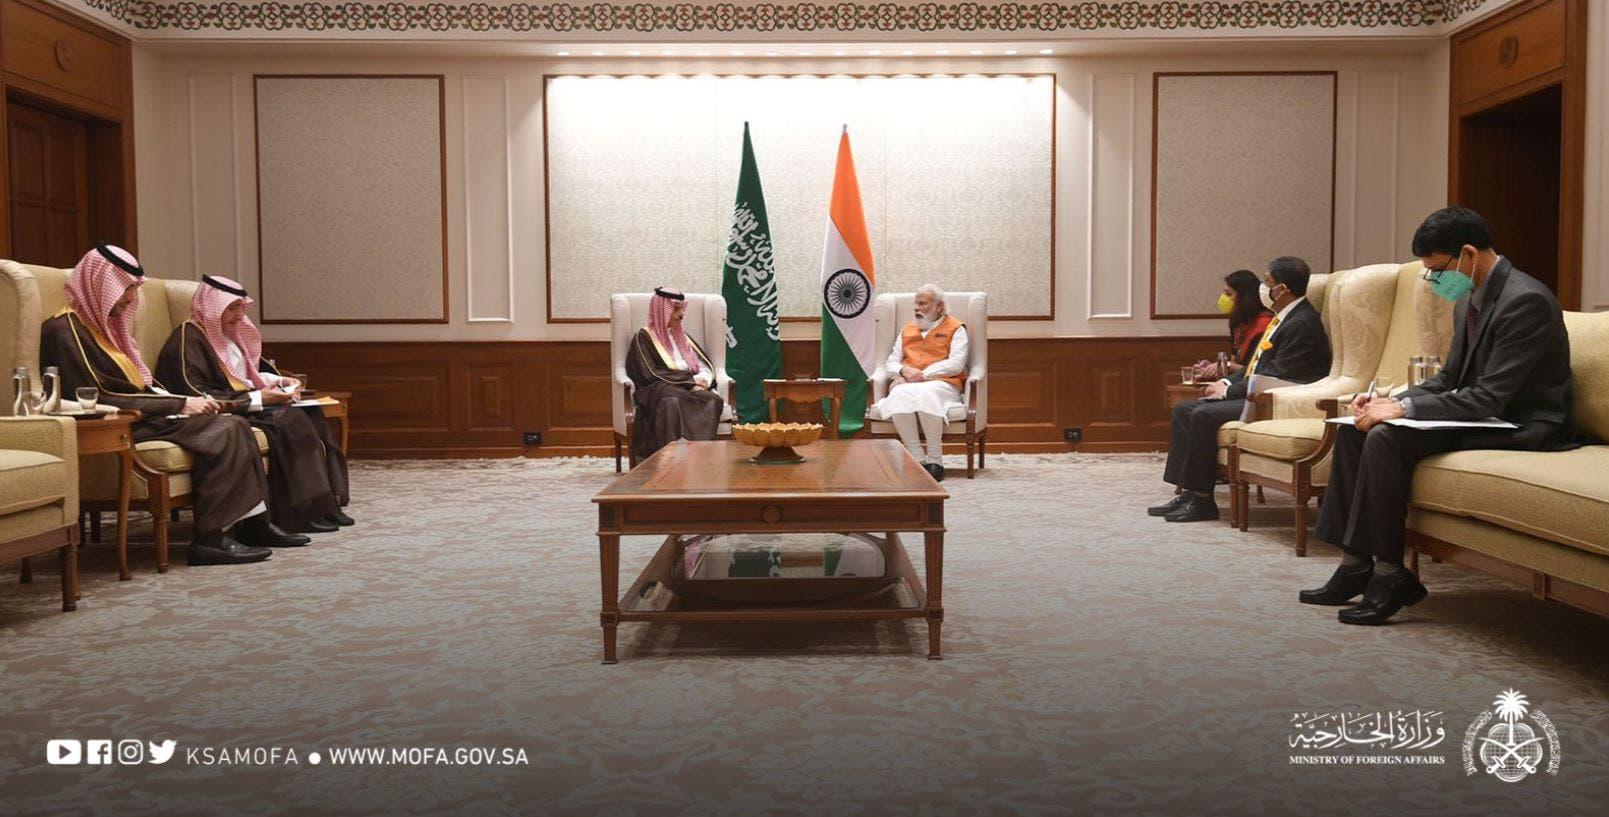 Saudi Arabia's Prince Faisal bin Farhan and India's Narendra Modi. (MoFA)